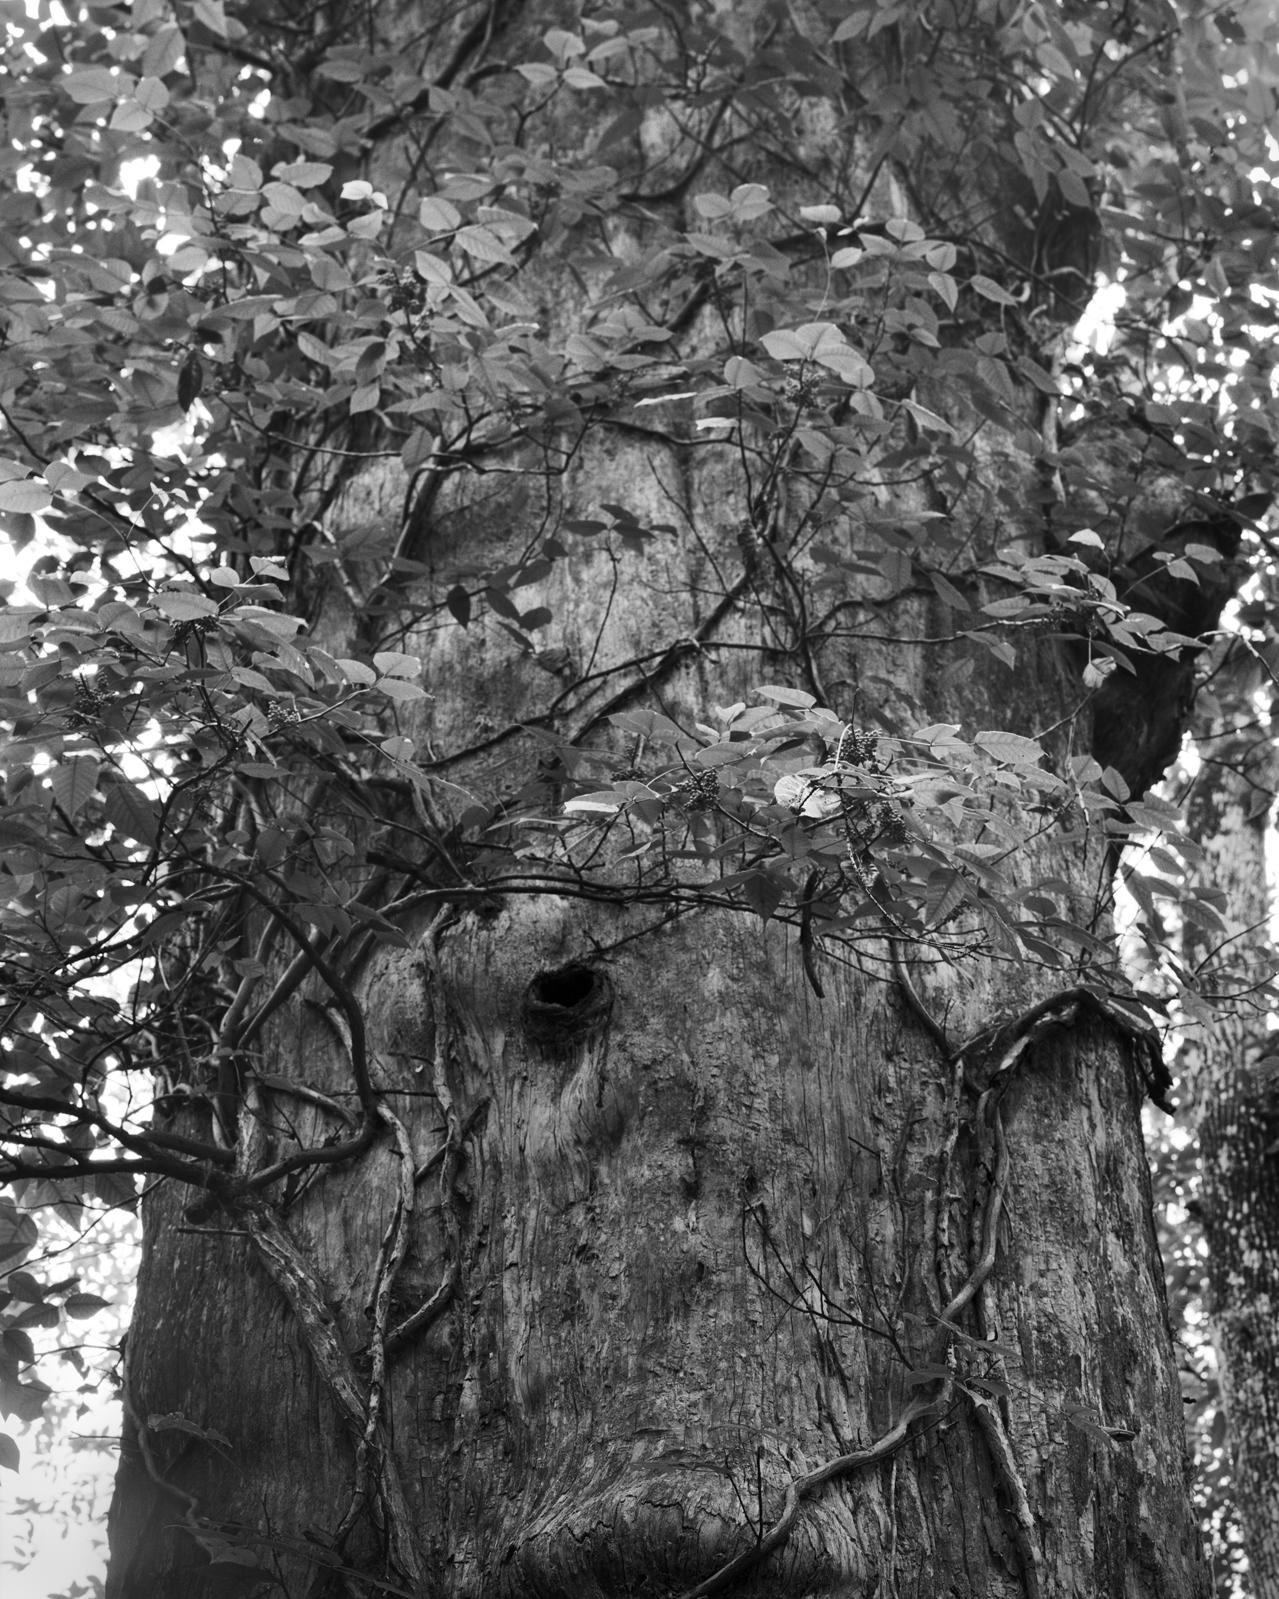 Cypress Tree, Study 2, Rice Creek, Florida. 2020